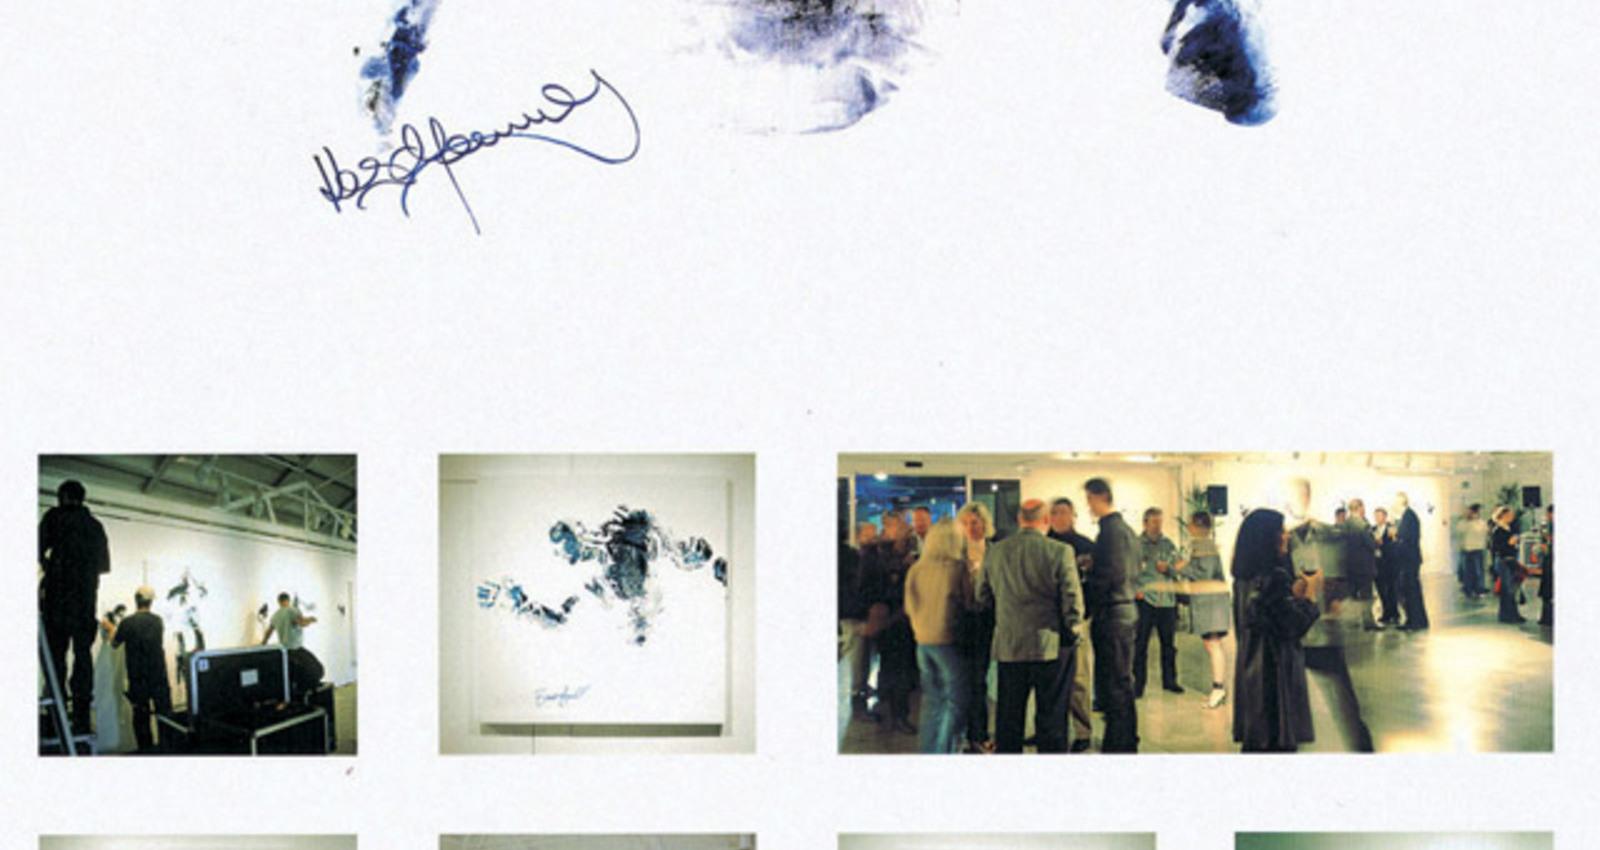 Ritchie McCaw, Jonah Lomu, Tana Umaga, London Outdoor, Tube Station